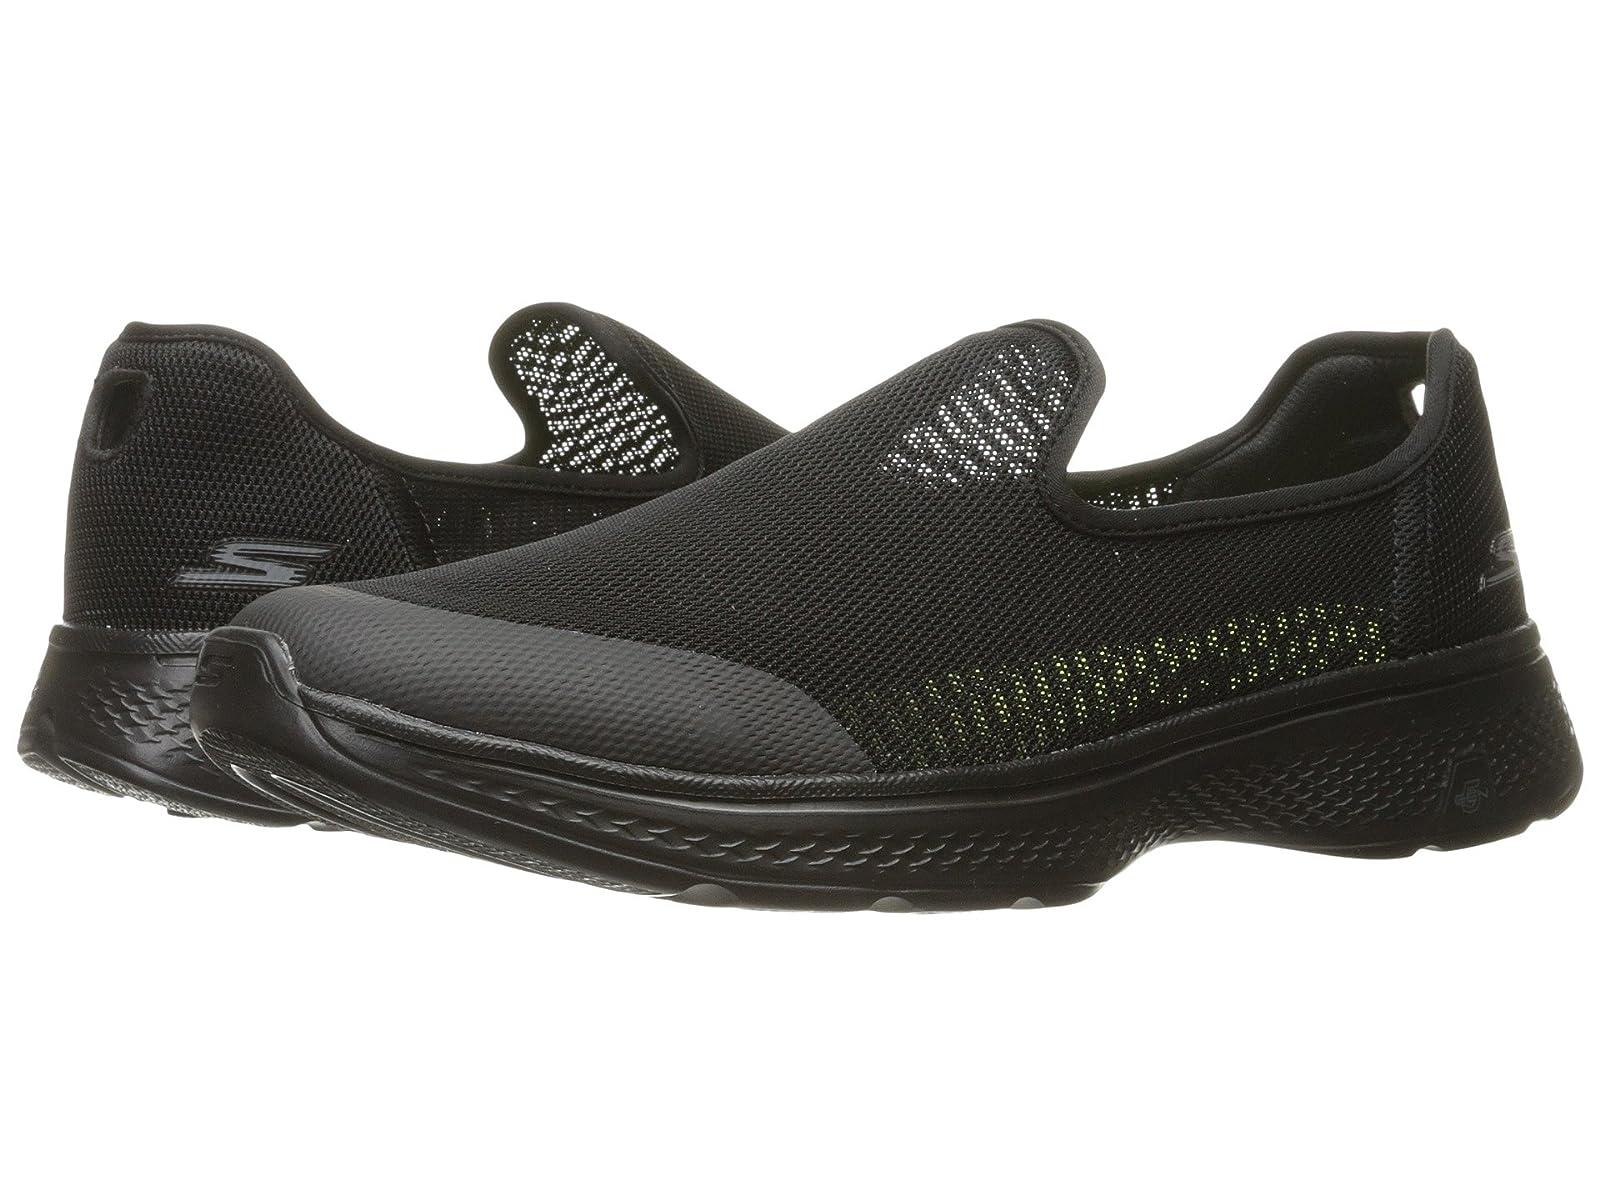 SKECHERS Performance Go Walk 4 - AdvanceCheap and distinctive eye-catching shoes